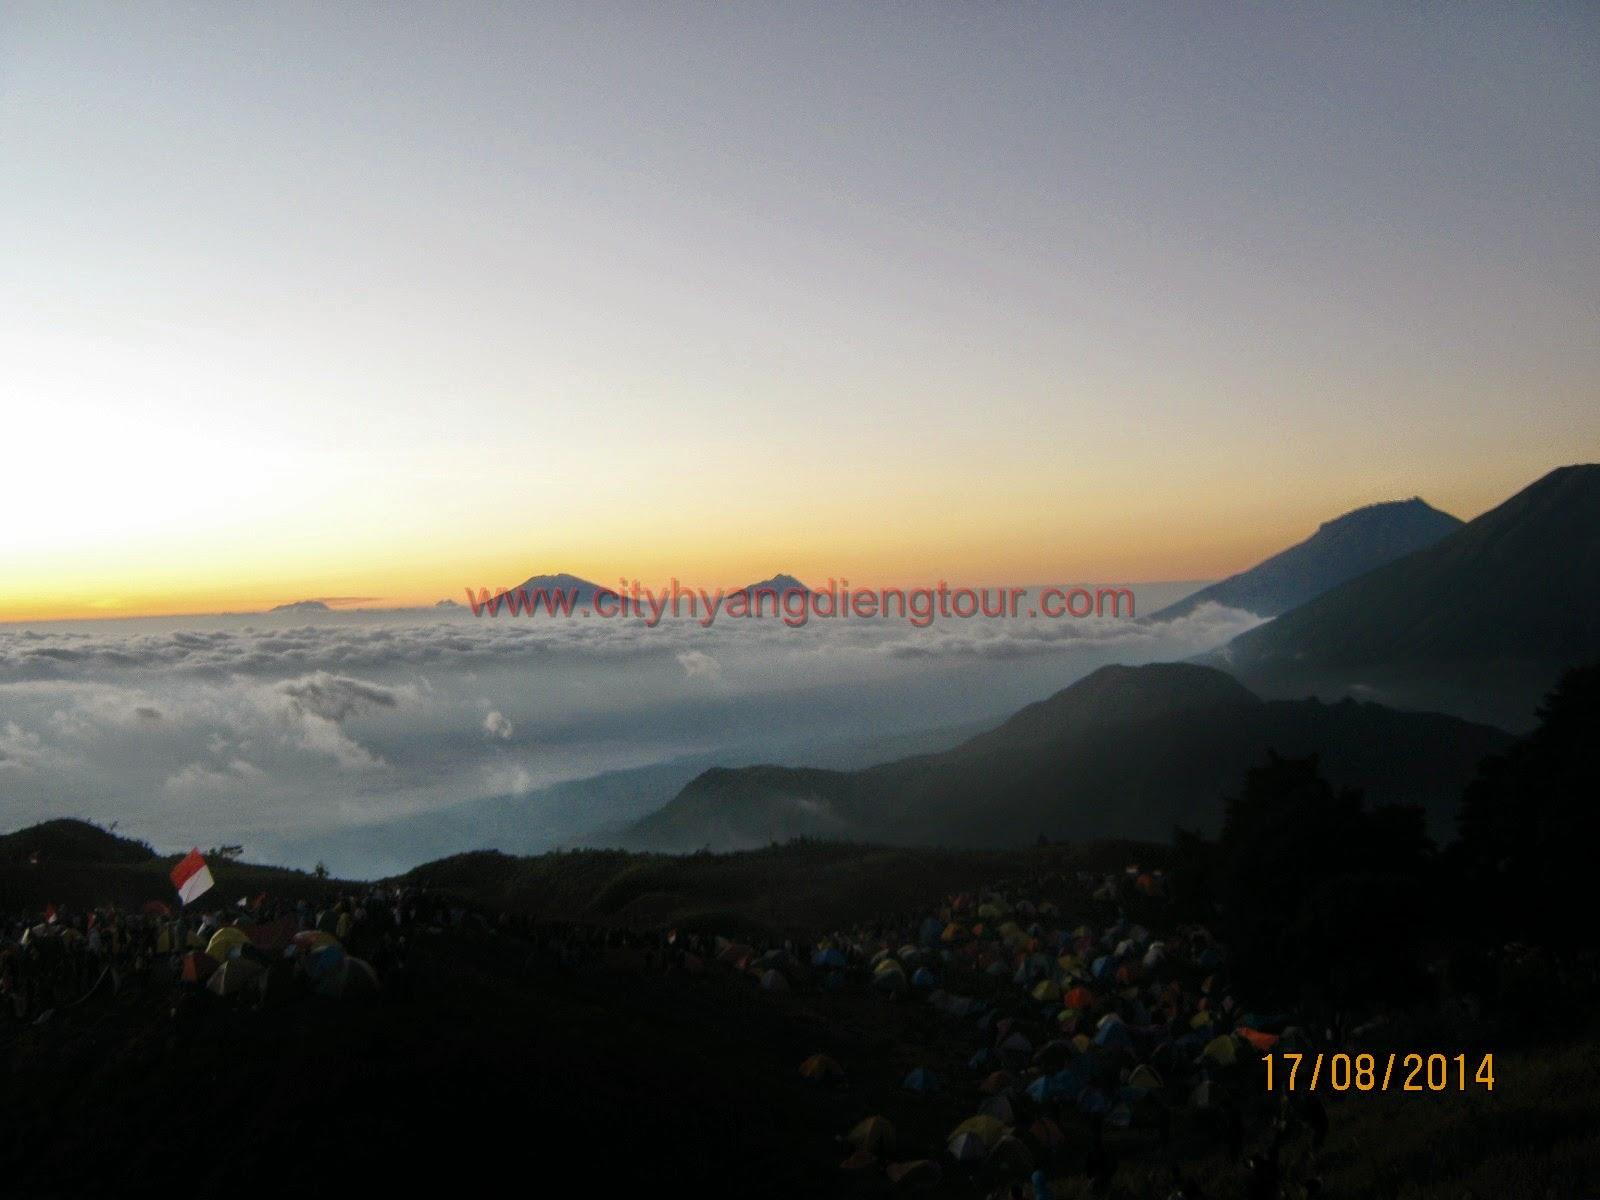 http://cityhyangdiengtour.blogspot.com/2014/08/gunung-prahu_22.html